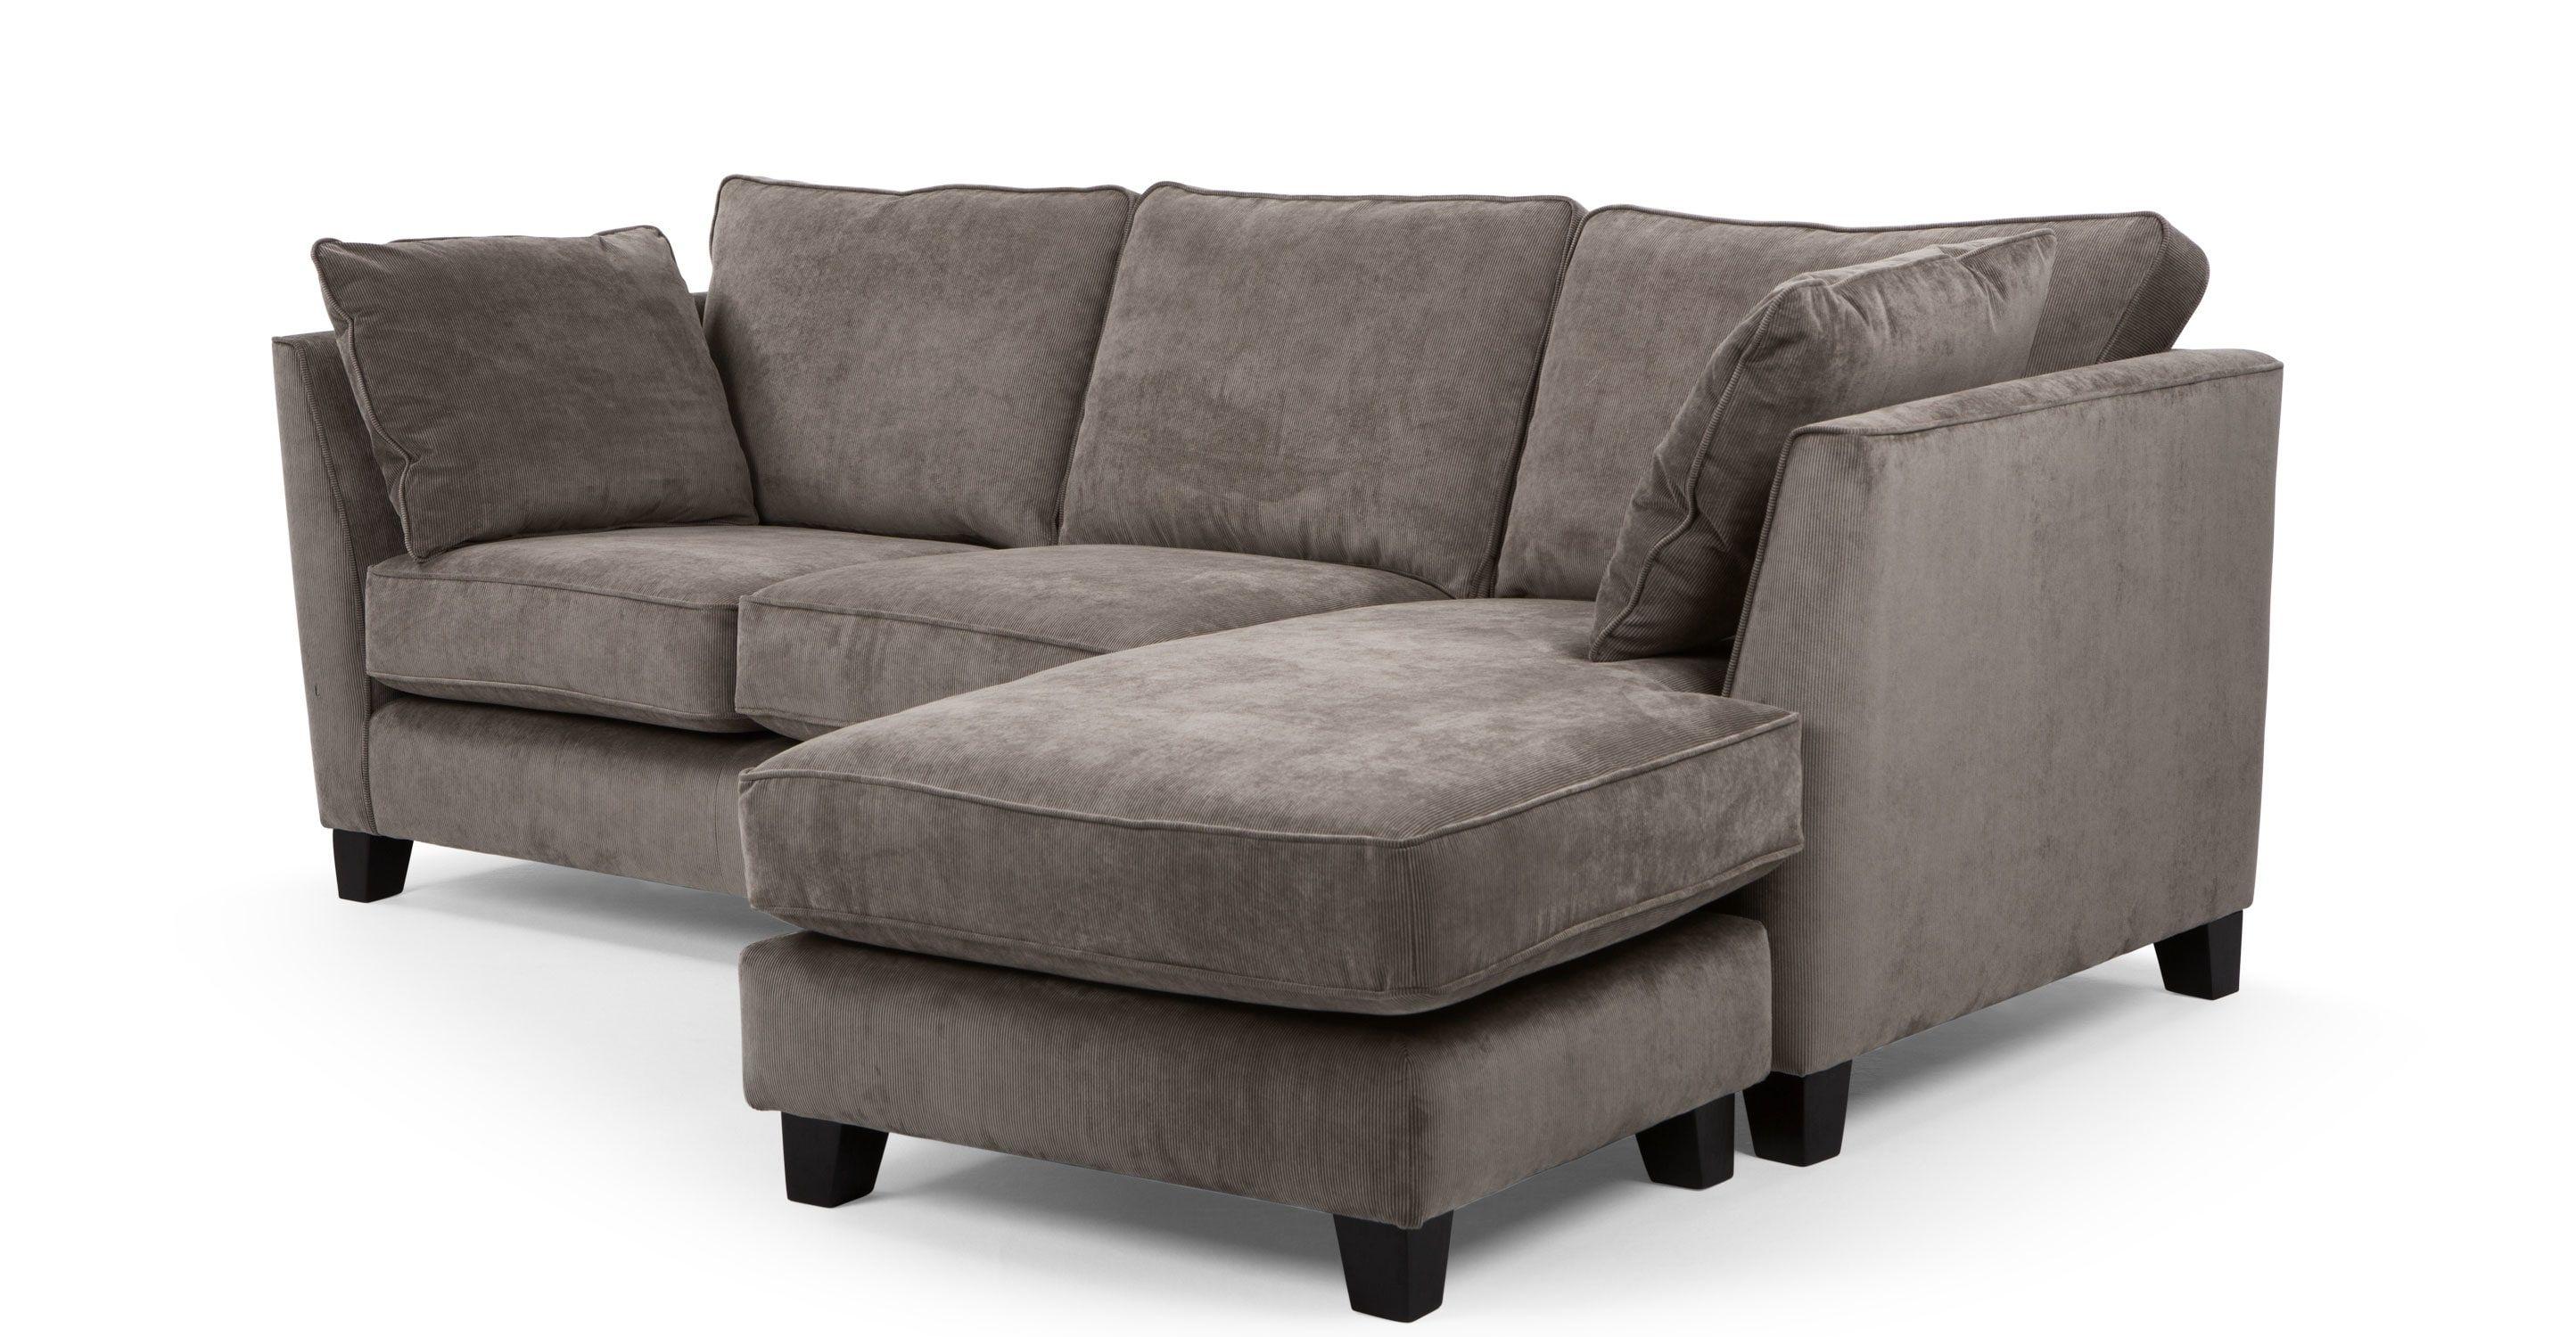 Wolseley Large Corner Sofa, Mid Grey Corduroy | Corner Sofa ...